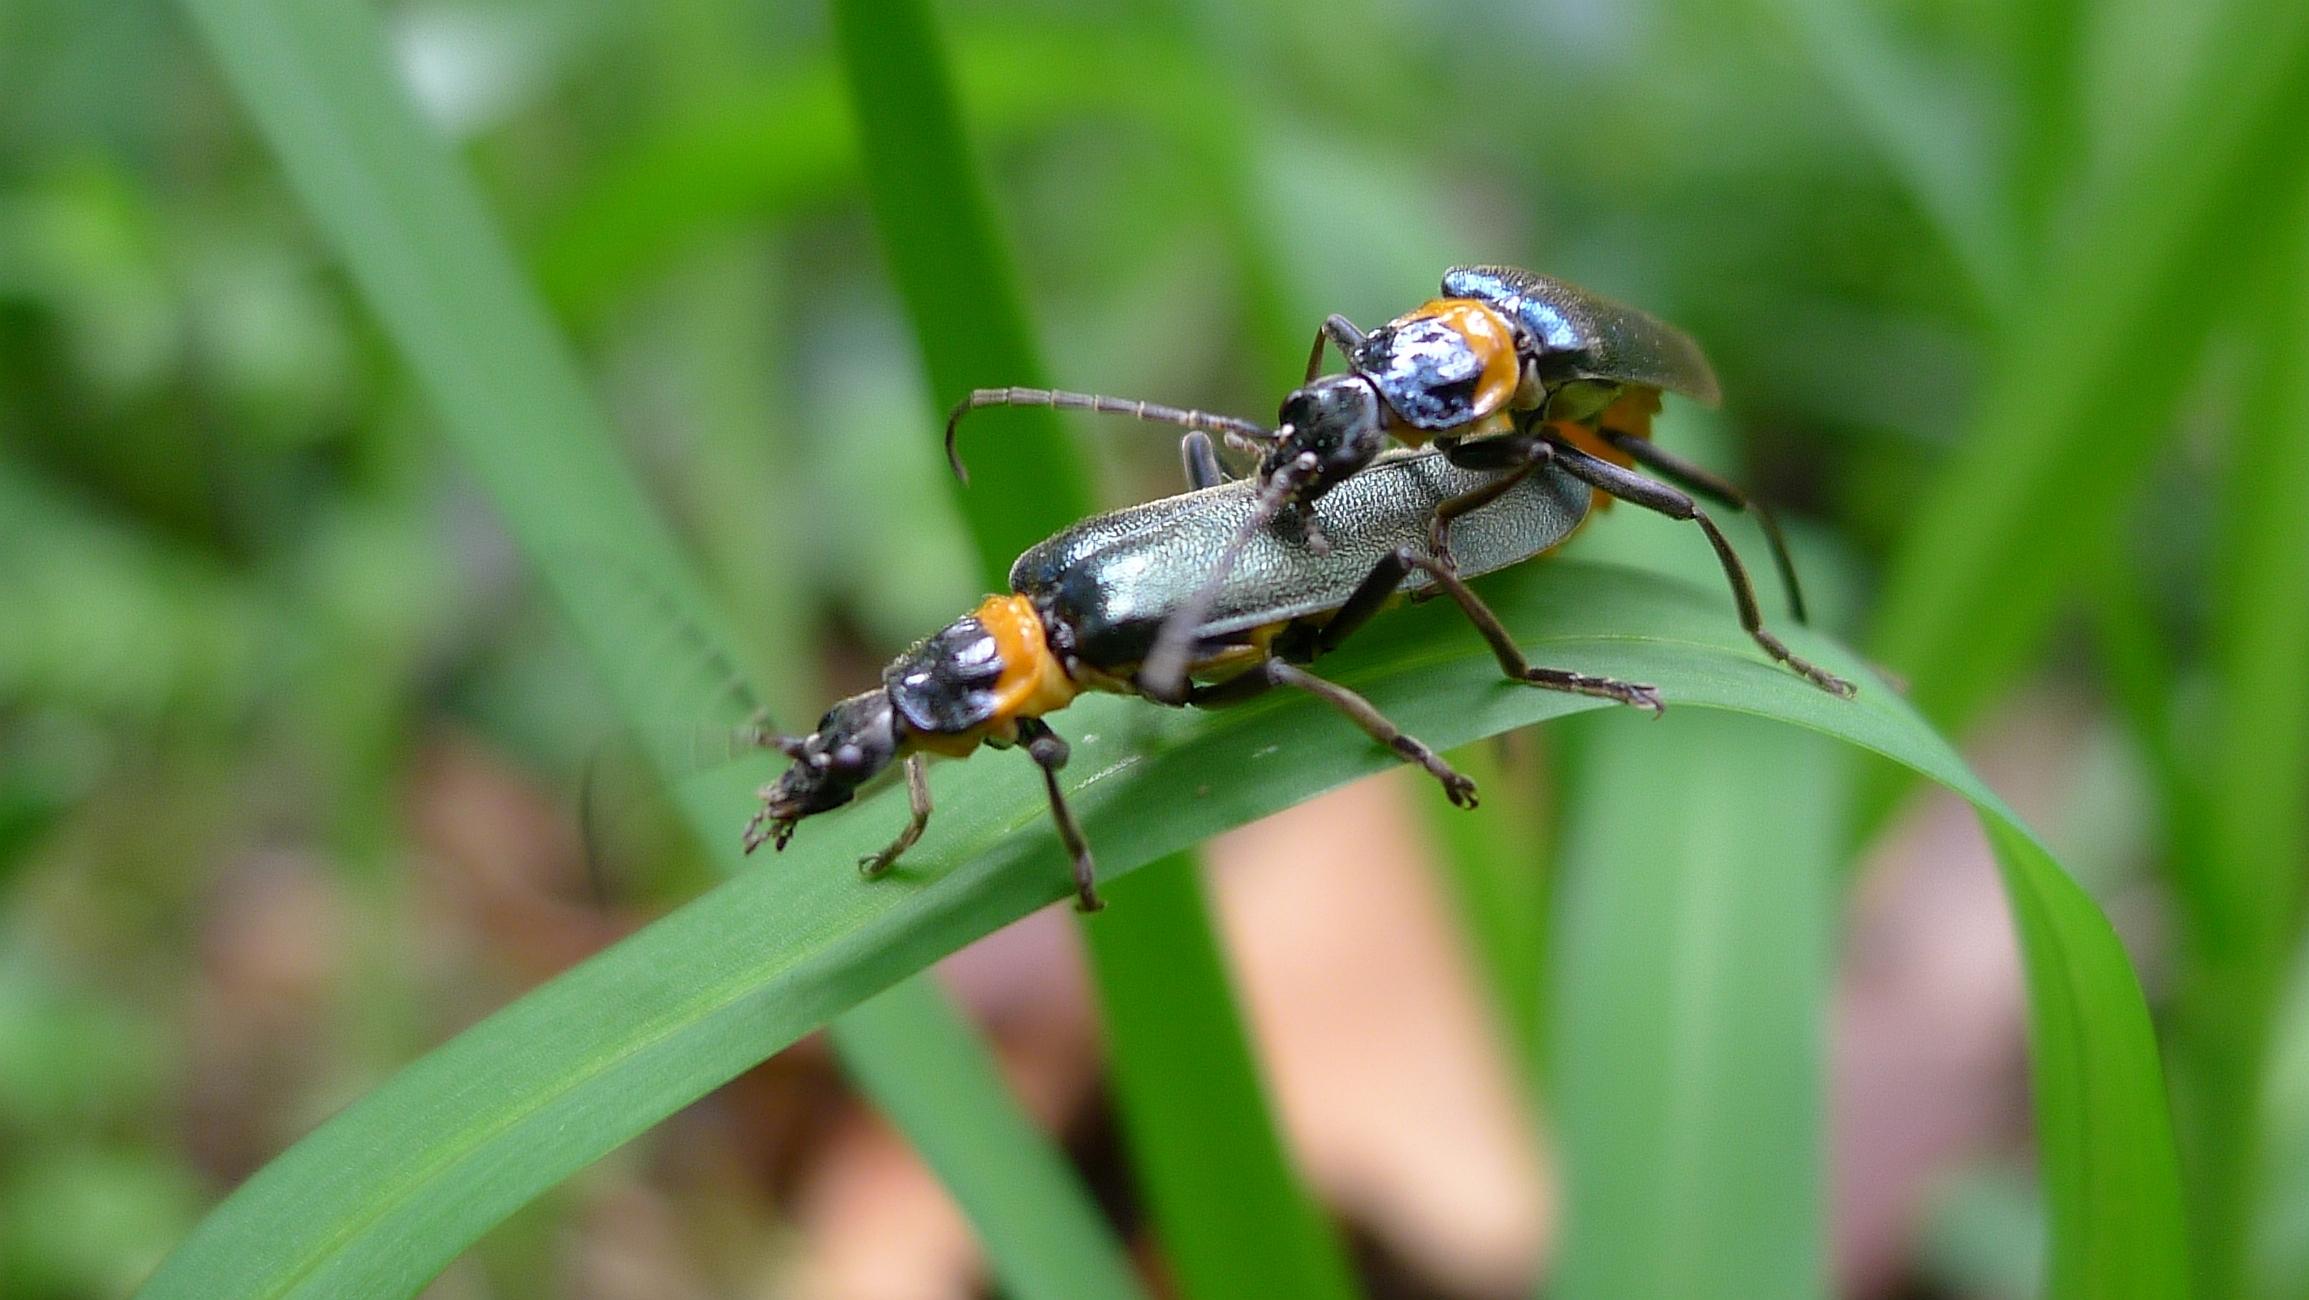 Chauliognathus   lugubris |  John Tann/Wikimedia Commons  [ CC BY 2.0 ]